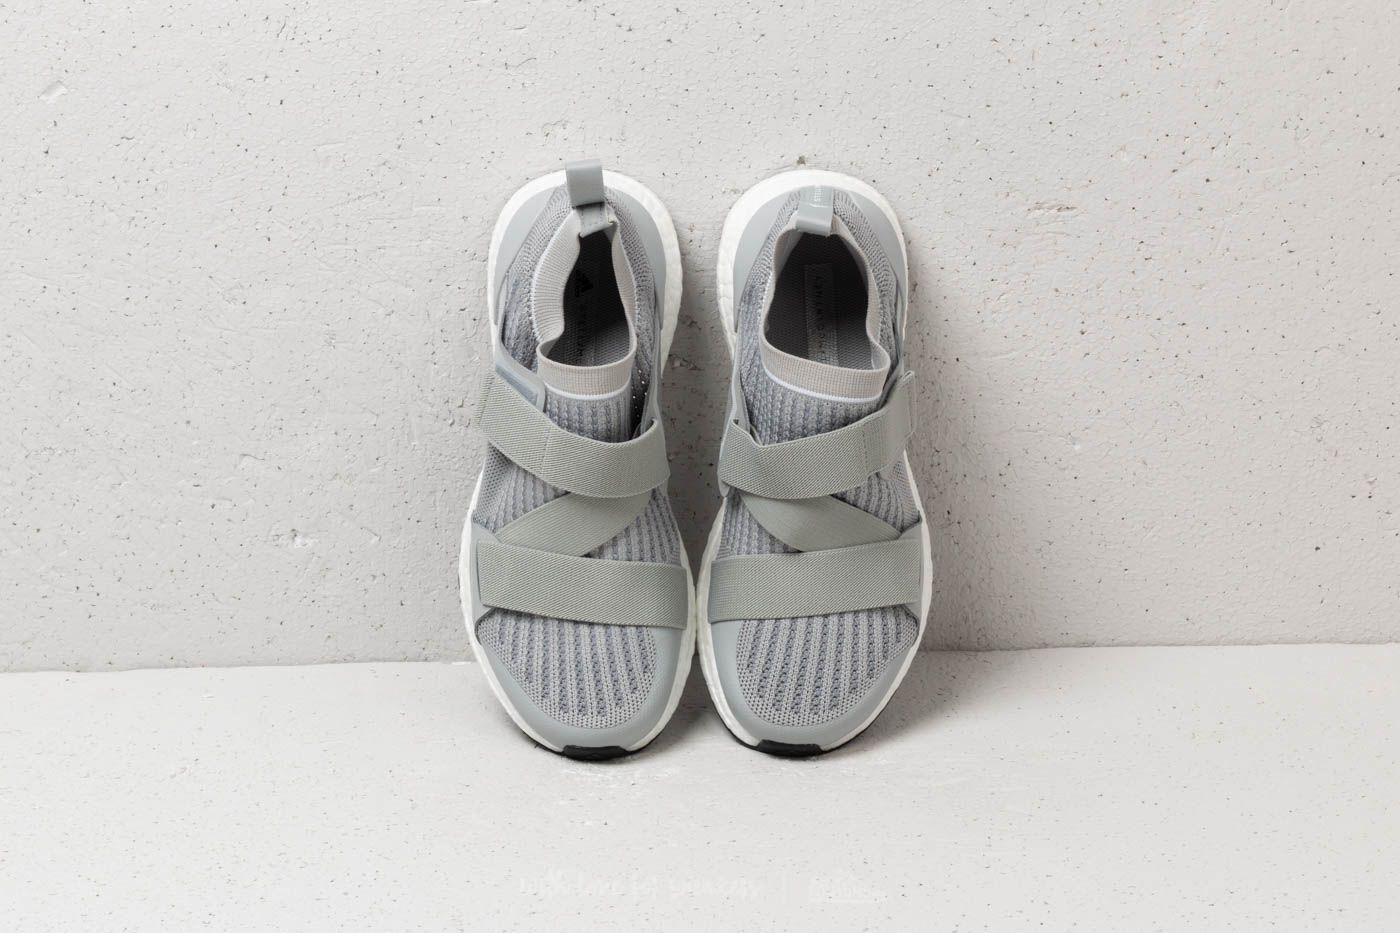 adidas by Stella McCartney UltraBOOST X Mid Zapatos Mujer